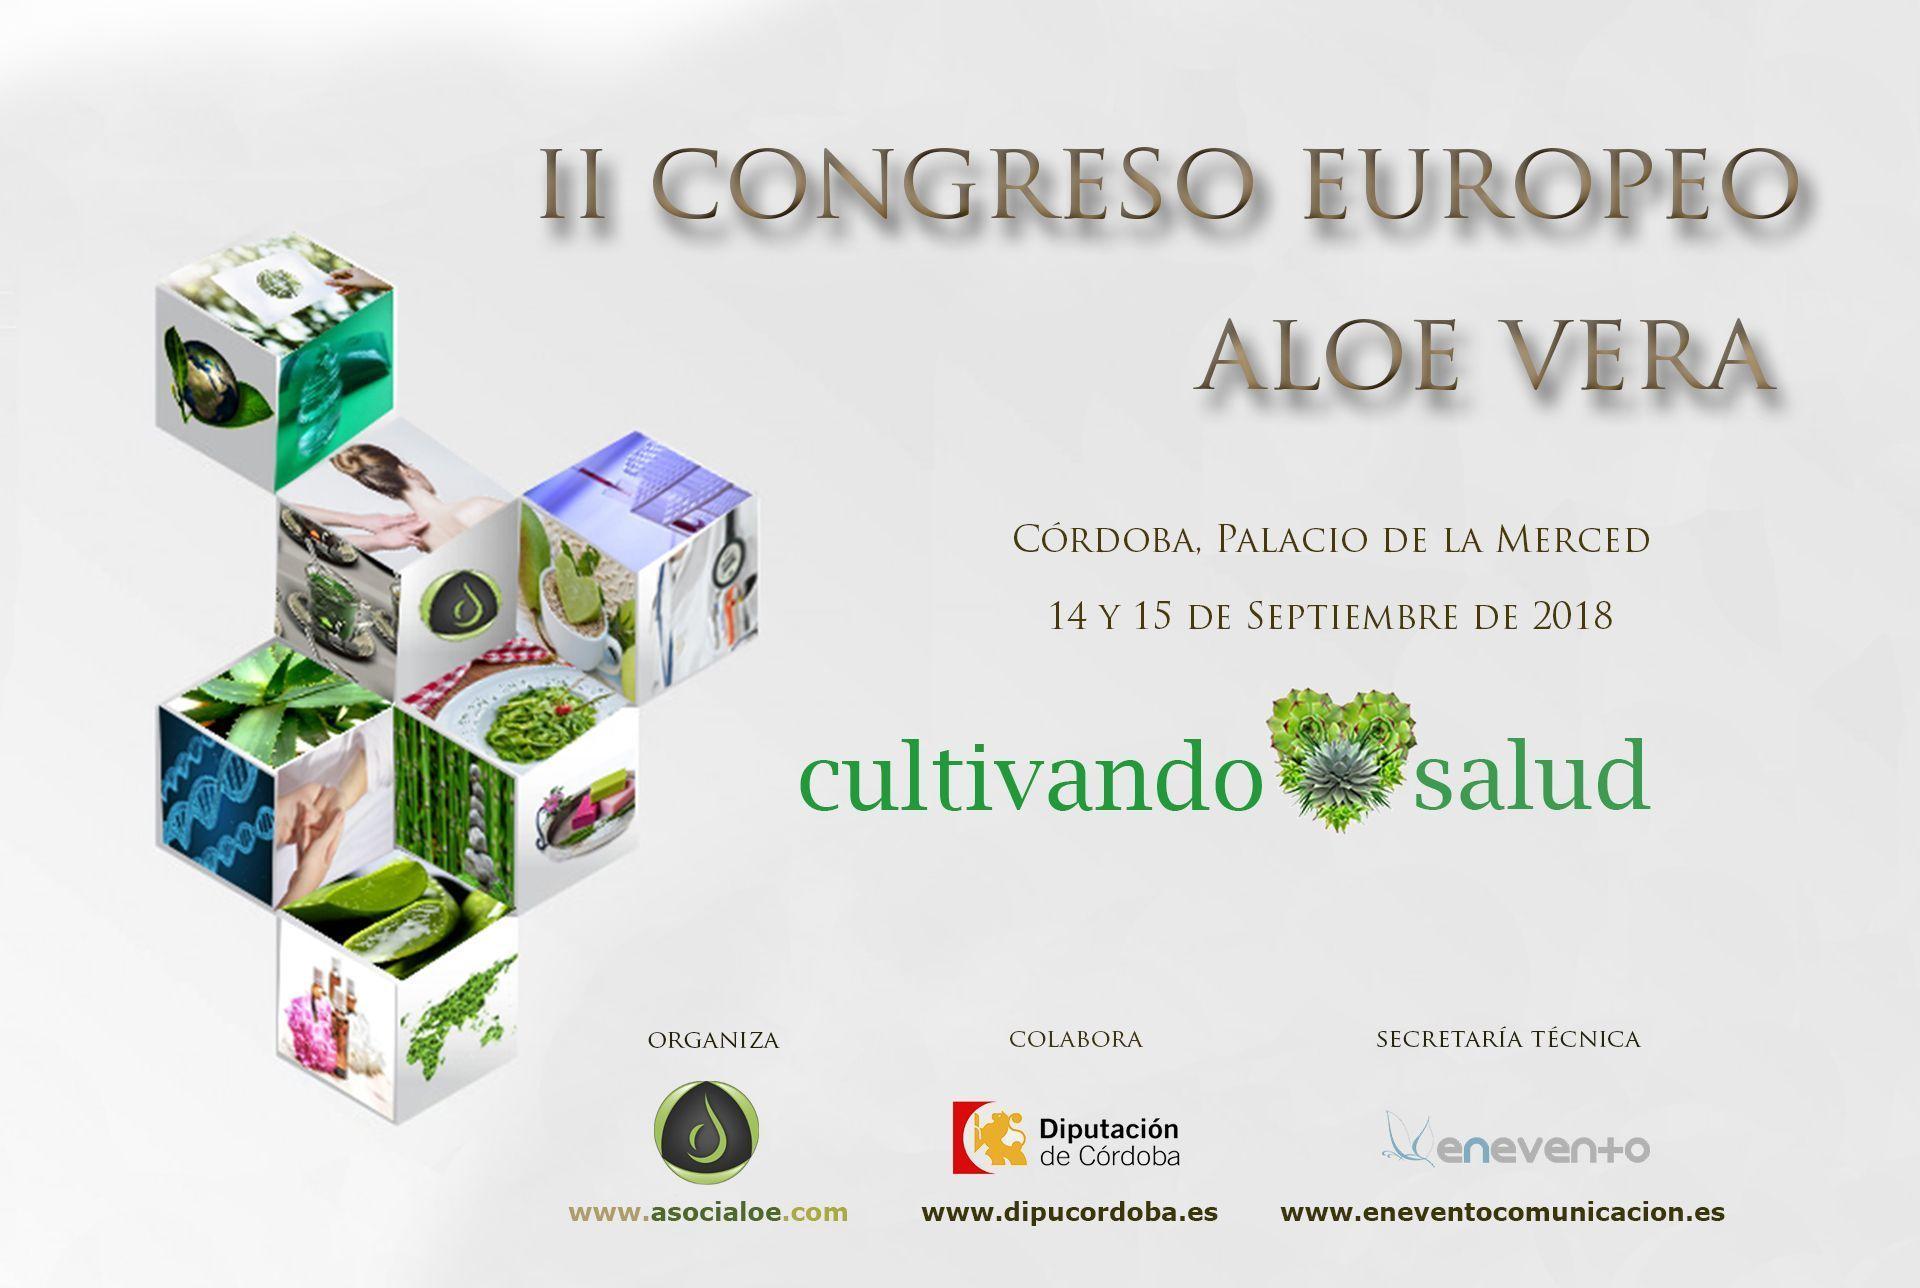 II Congreso Europeo Aloe Vera